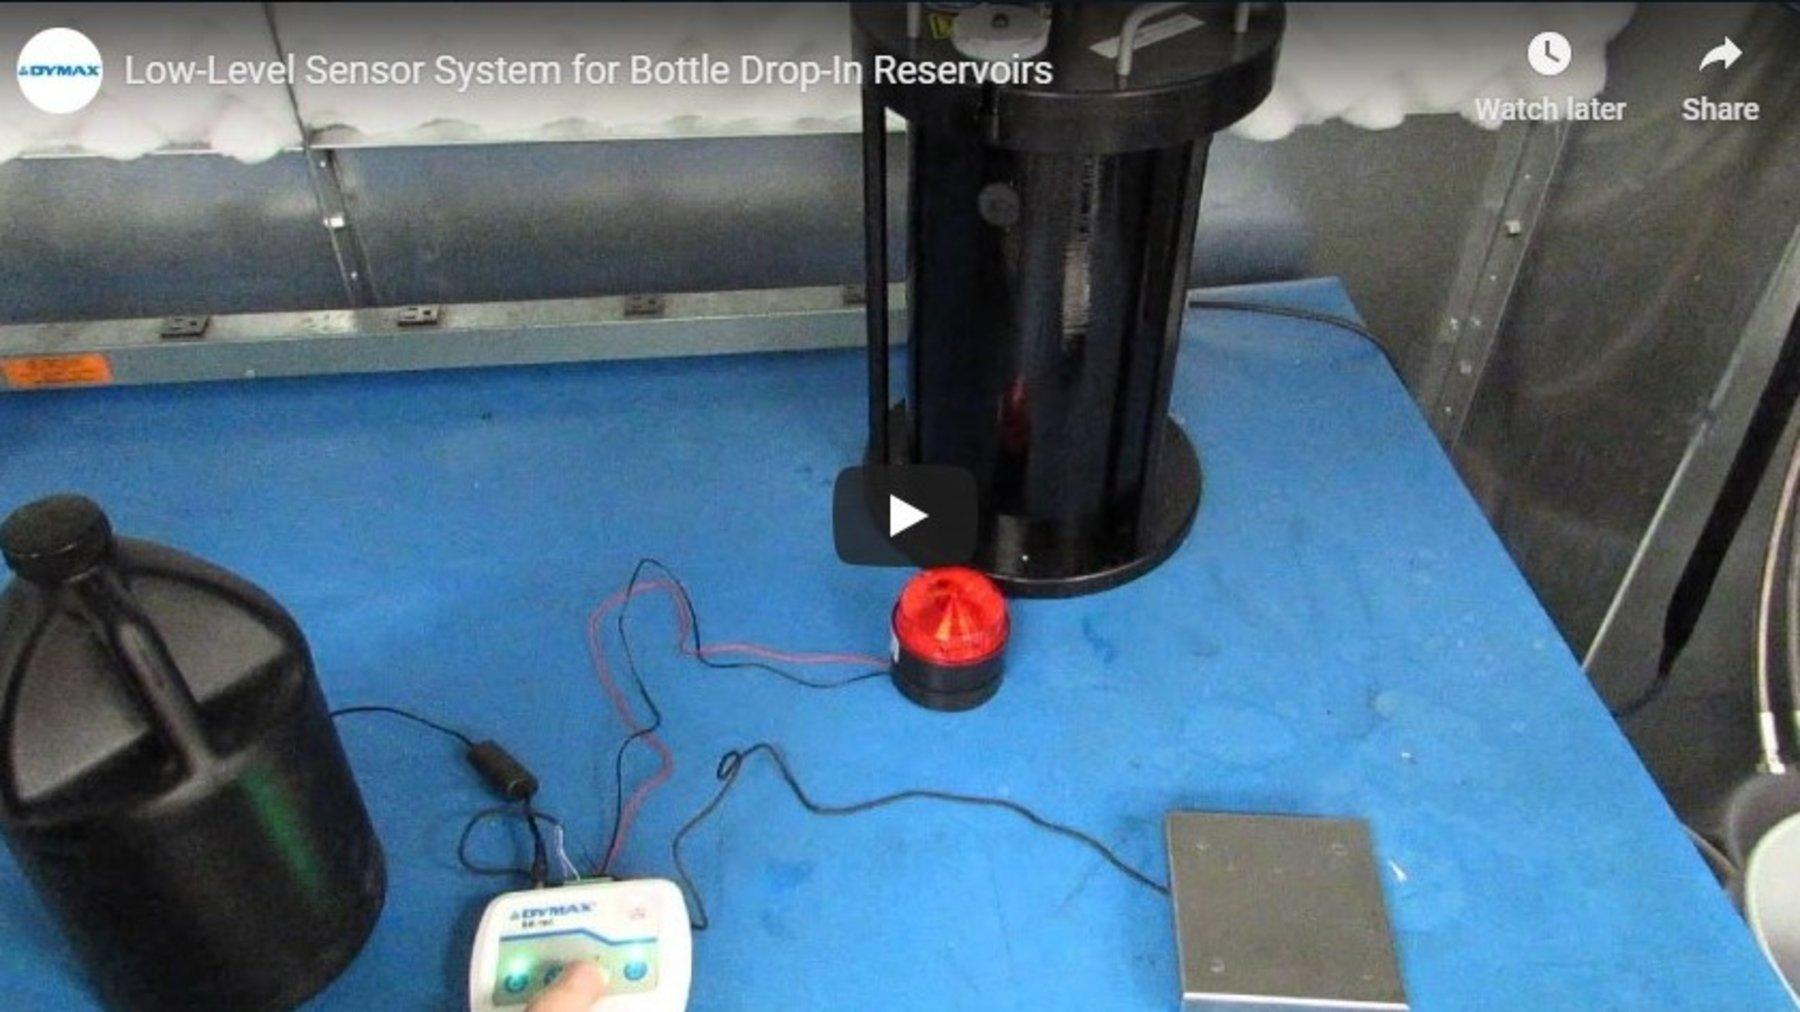 Low-Level Sensor System for Bottle Drop-In Reservoirs